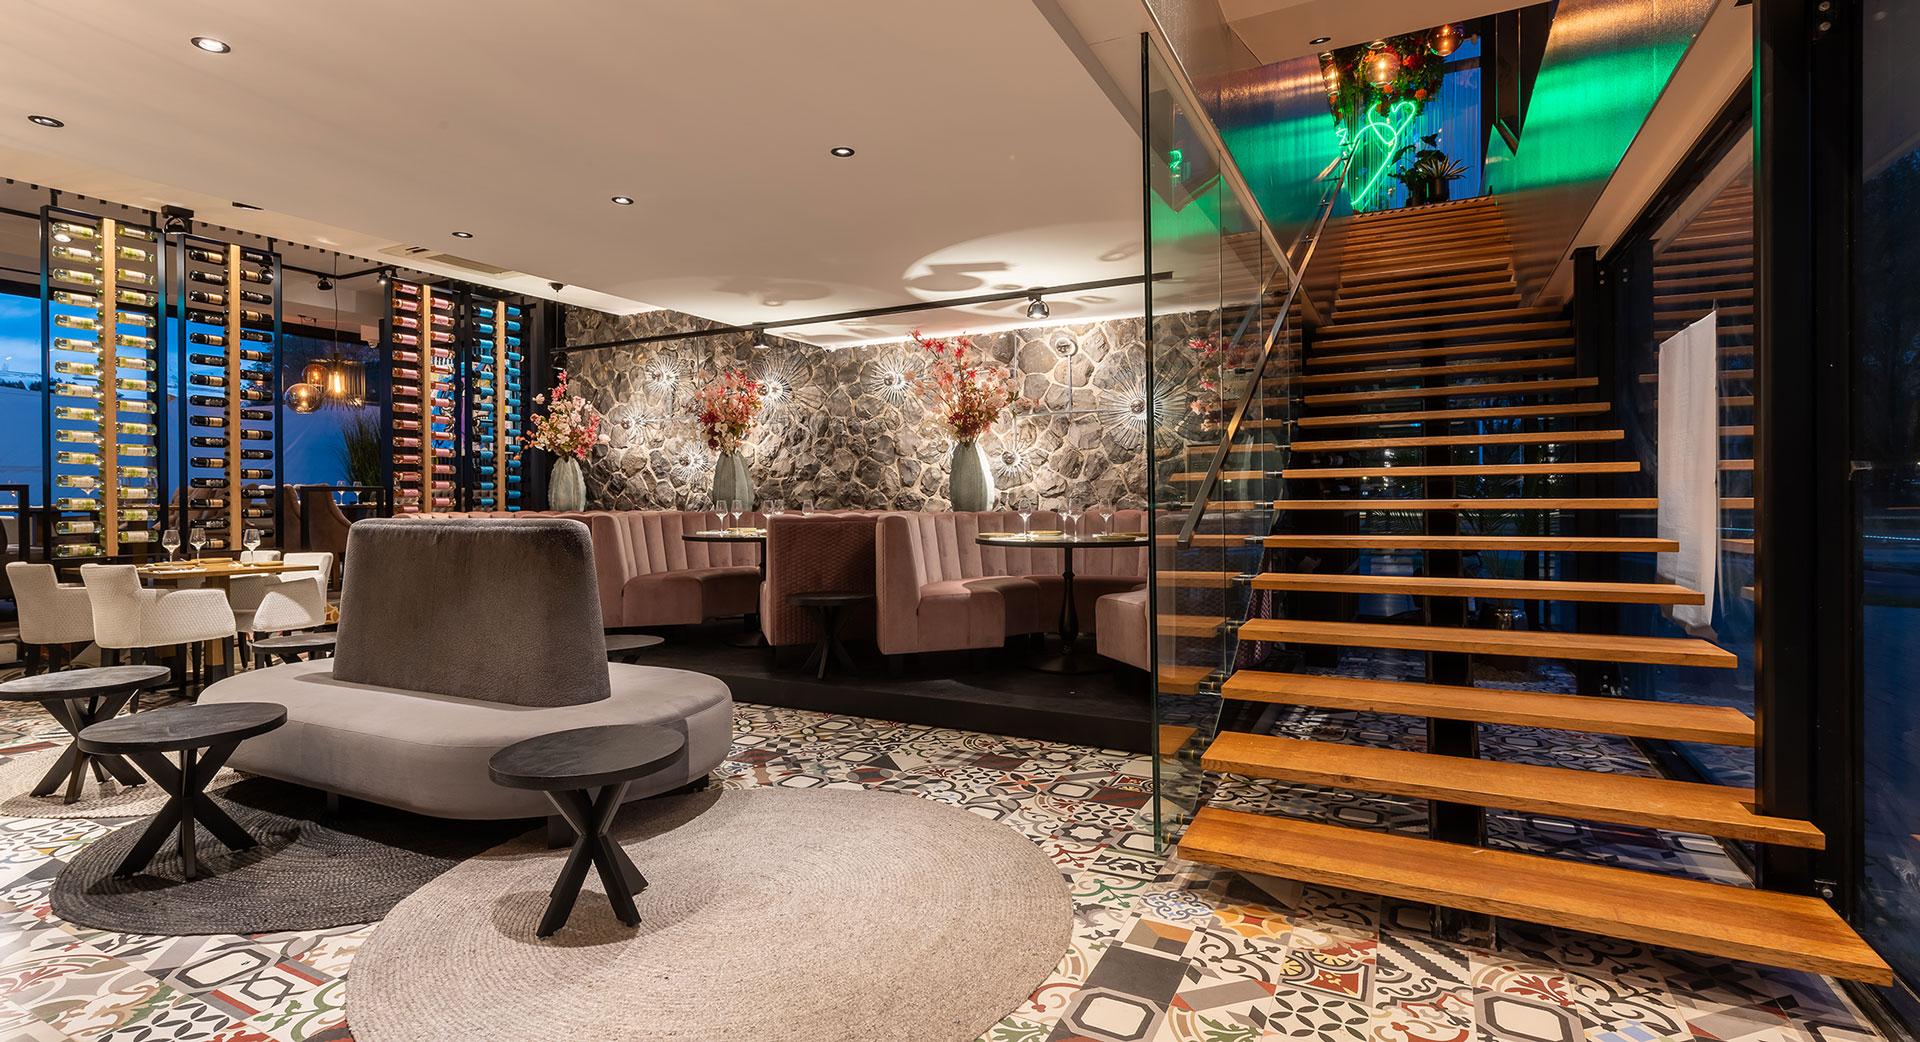 nieuwe-hotspot-amsterdam-restauran2t-oeverzicht